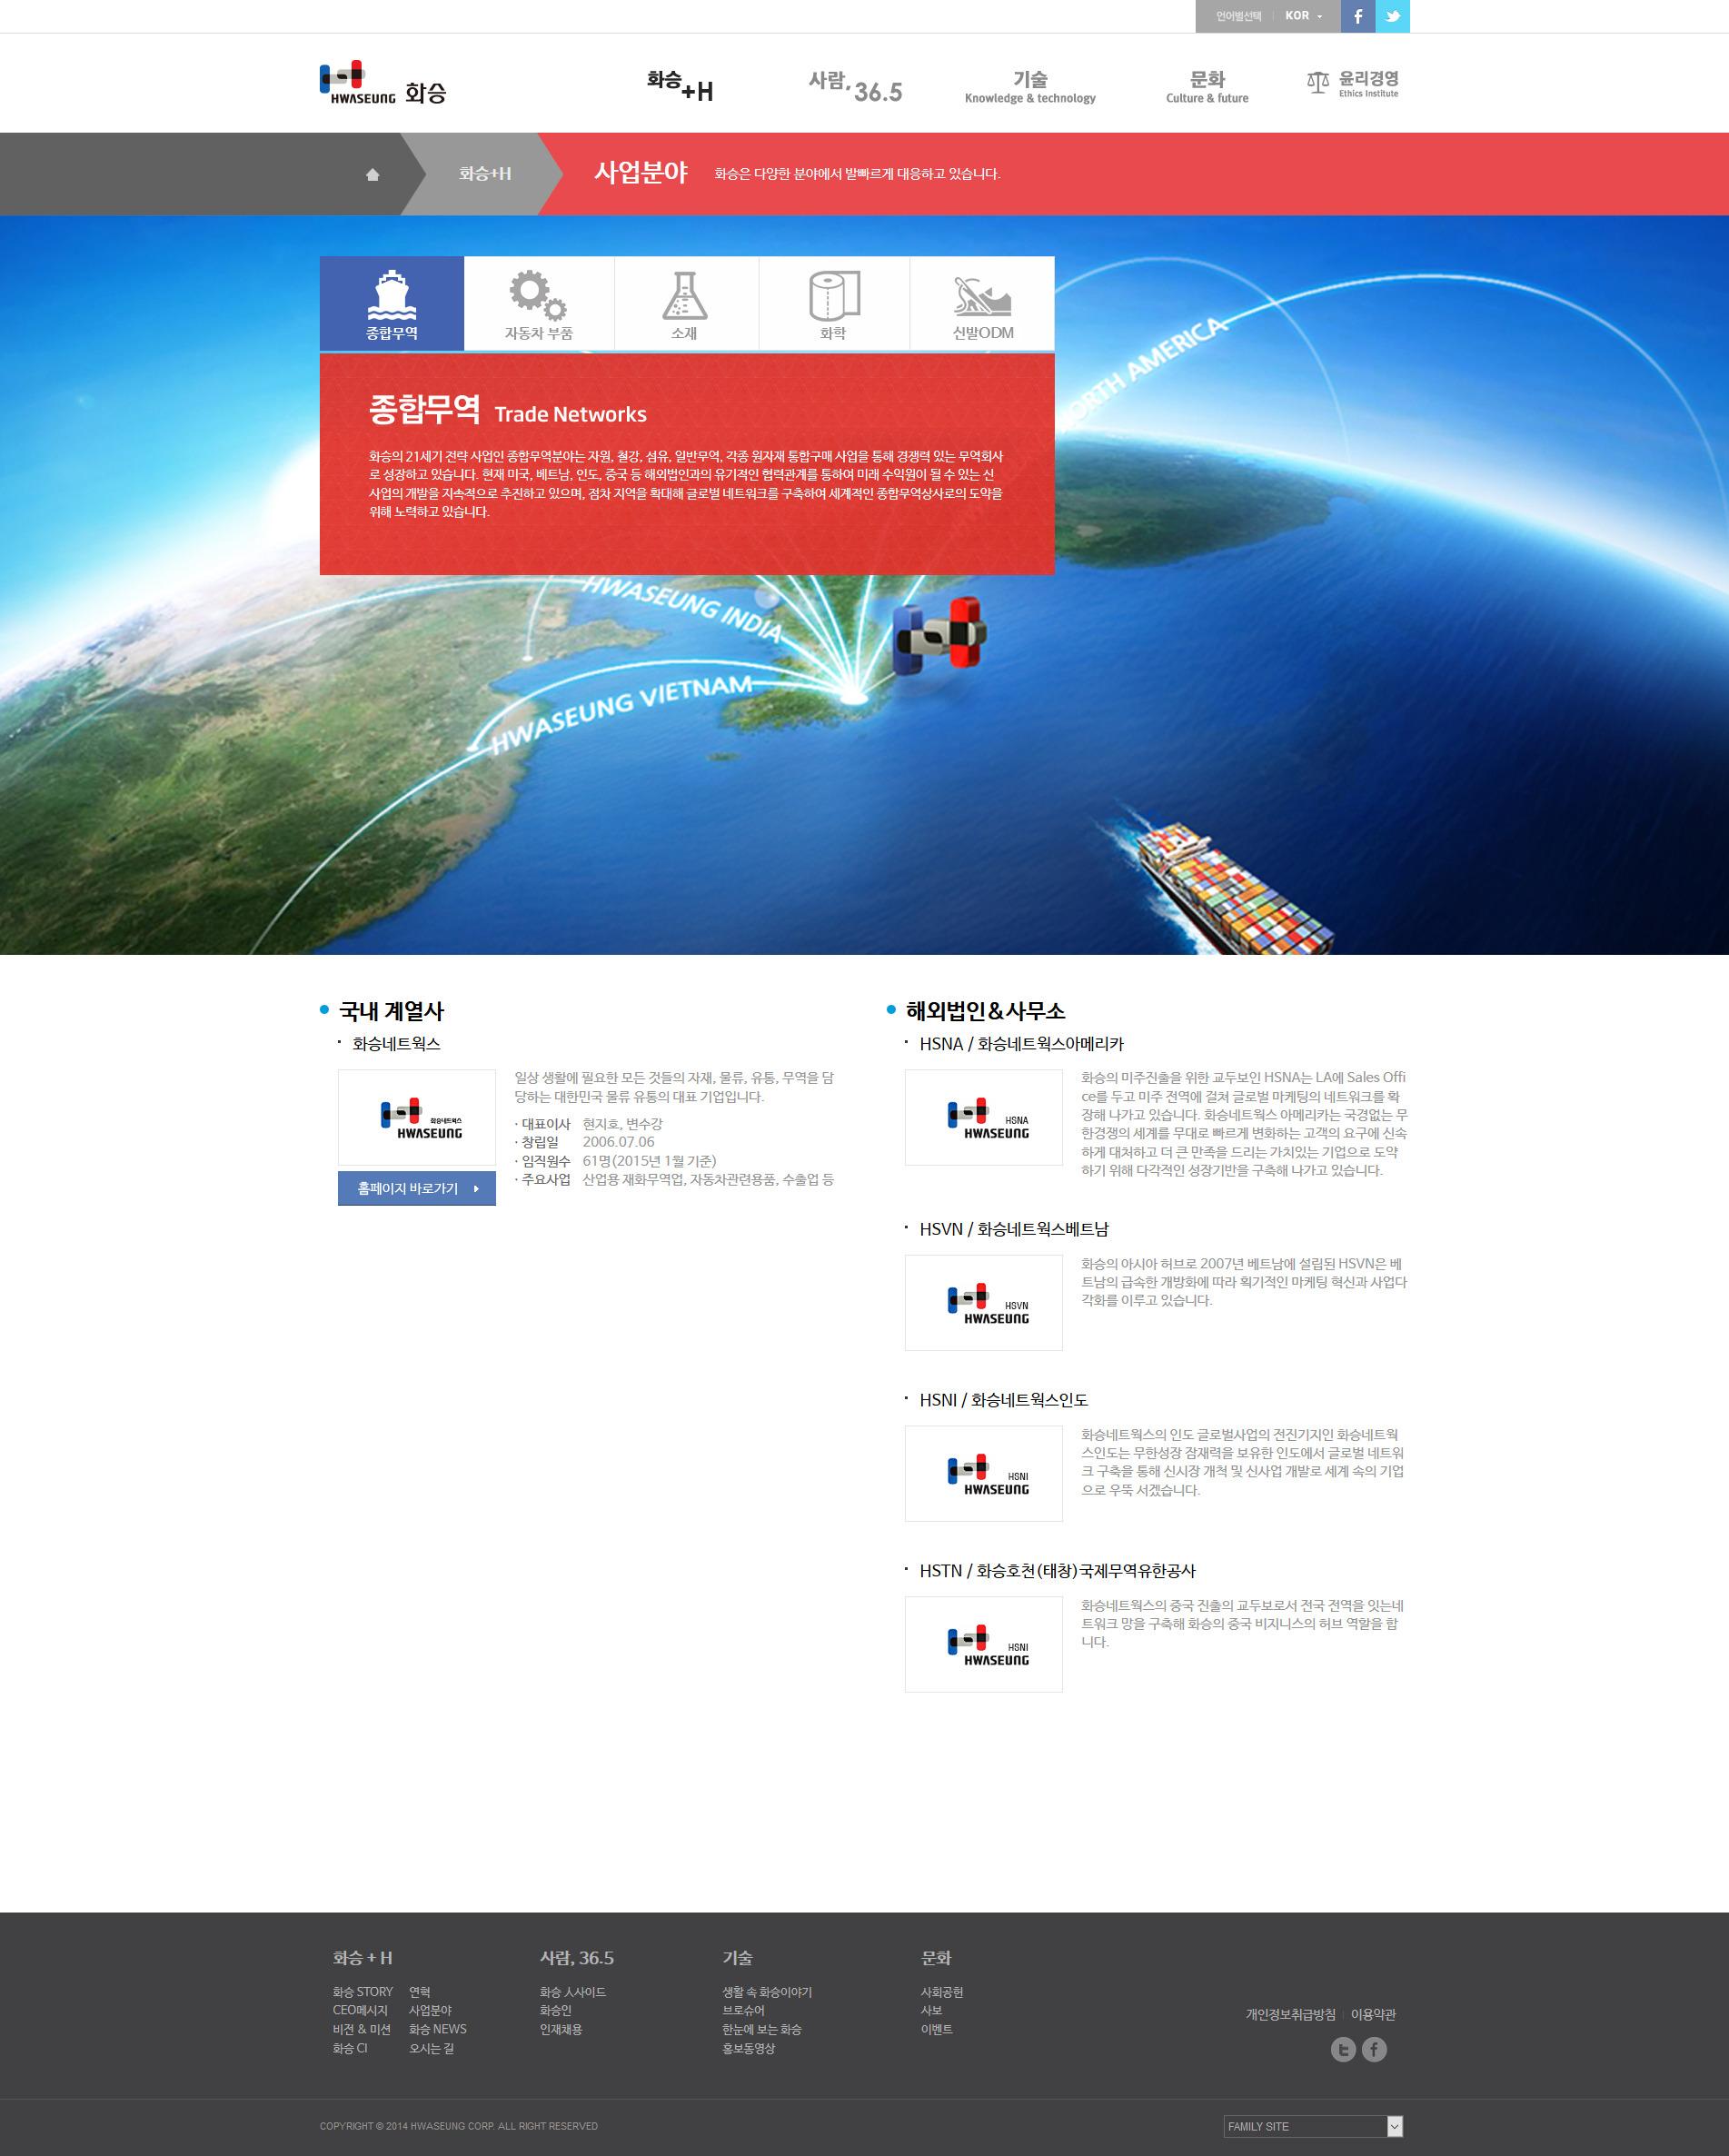 Screenshot-2018-1-4 사업분야 화승 +H 화승 - HWASEUNG.jpg